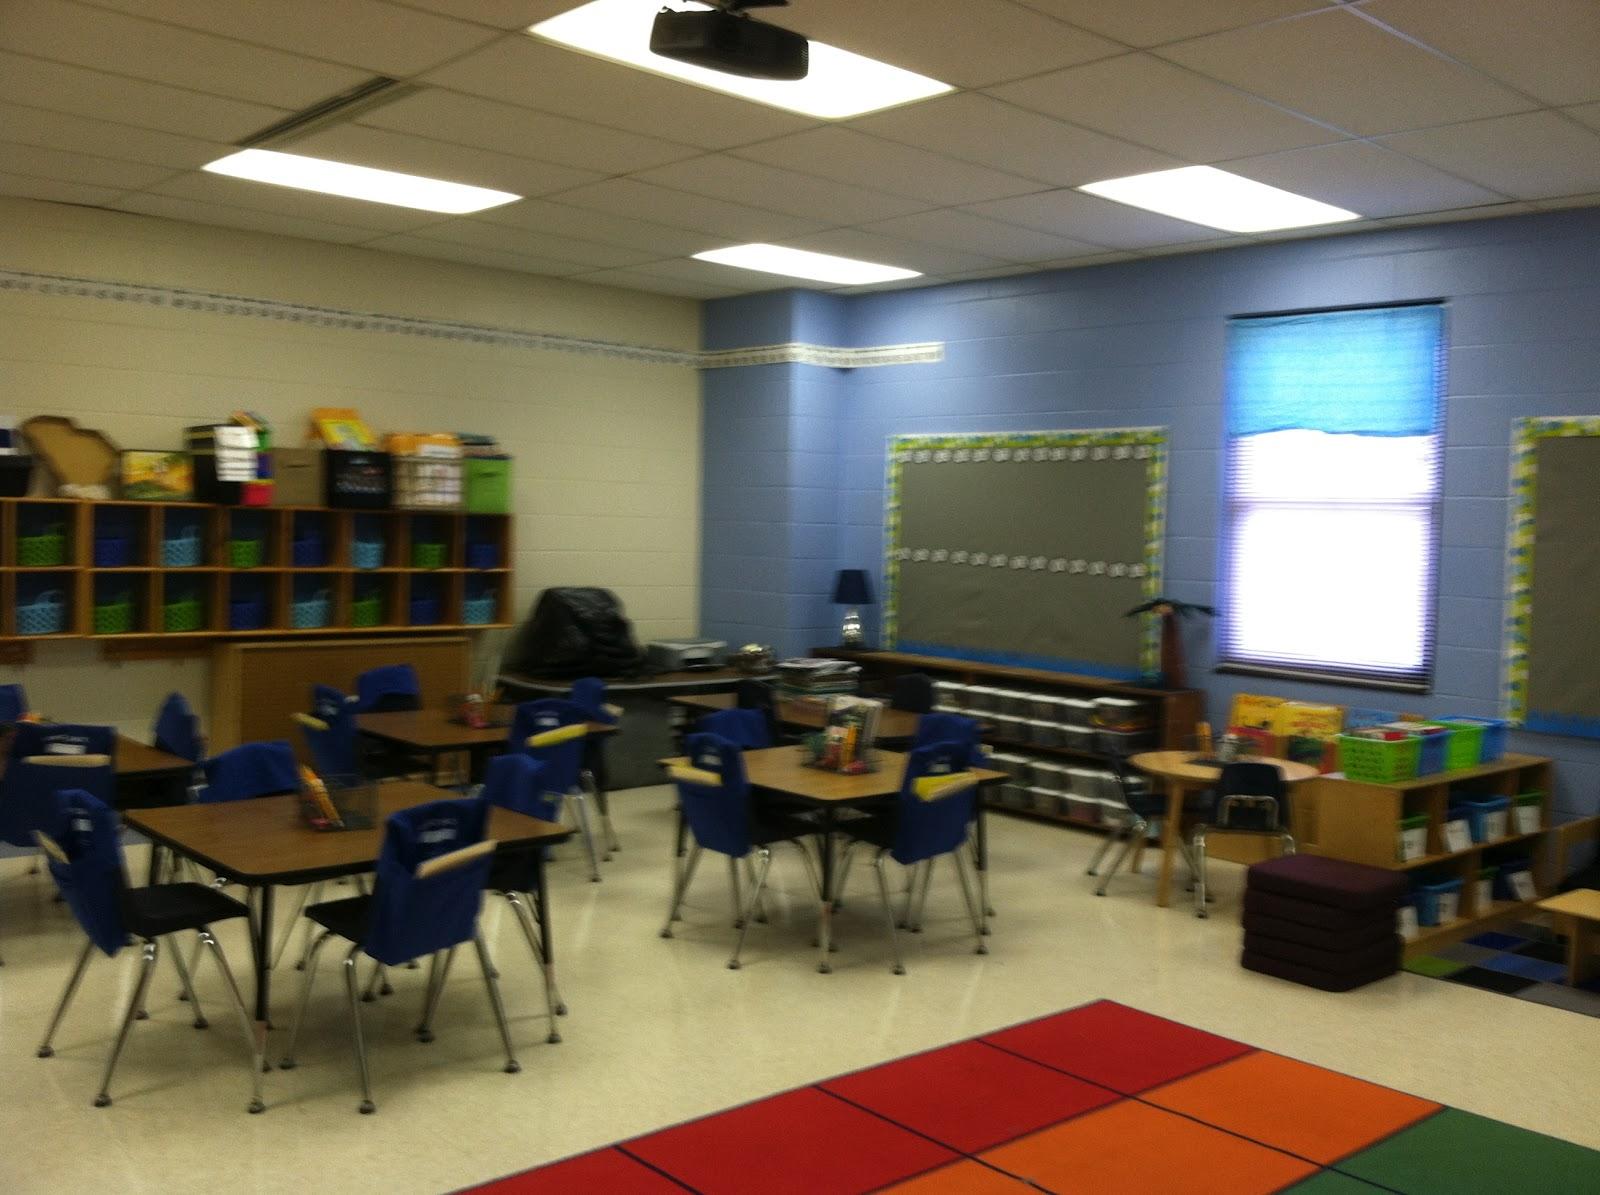 classroom - photo #9